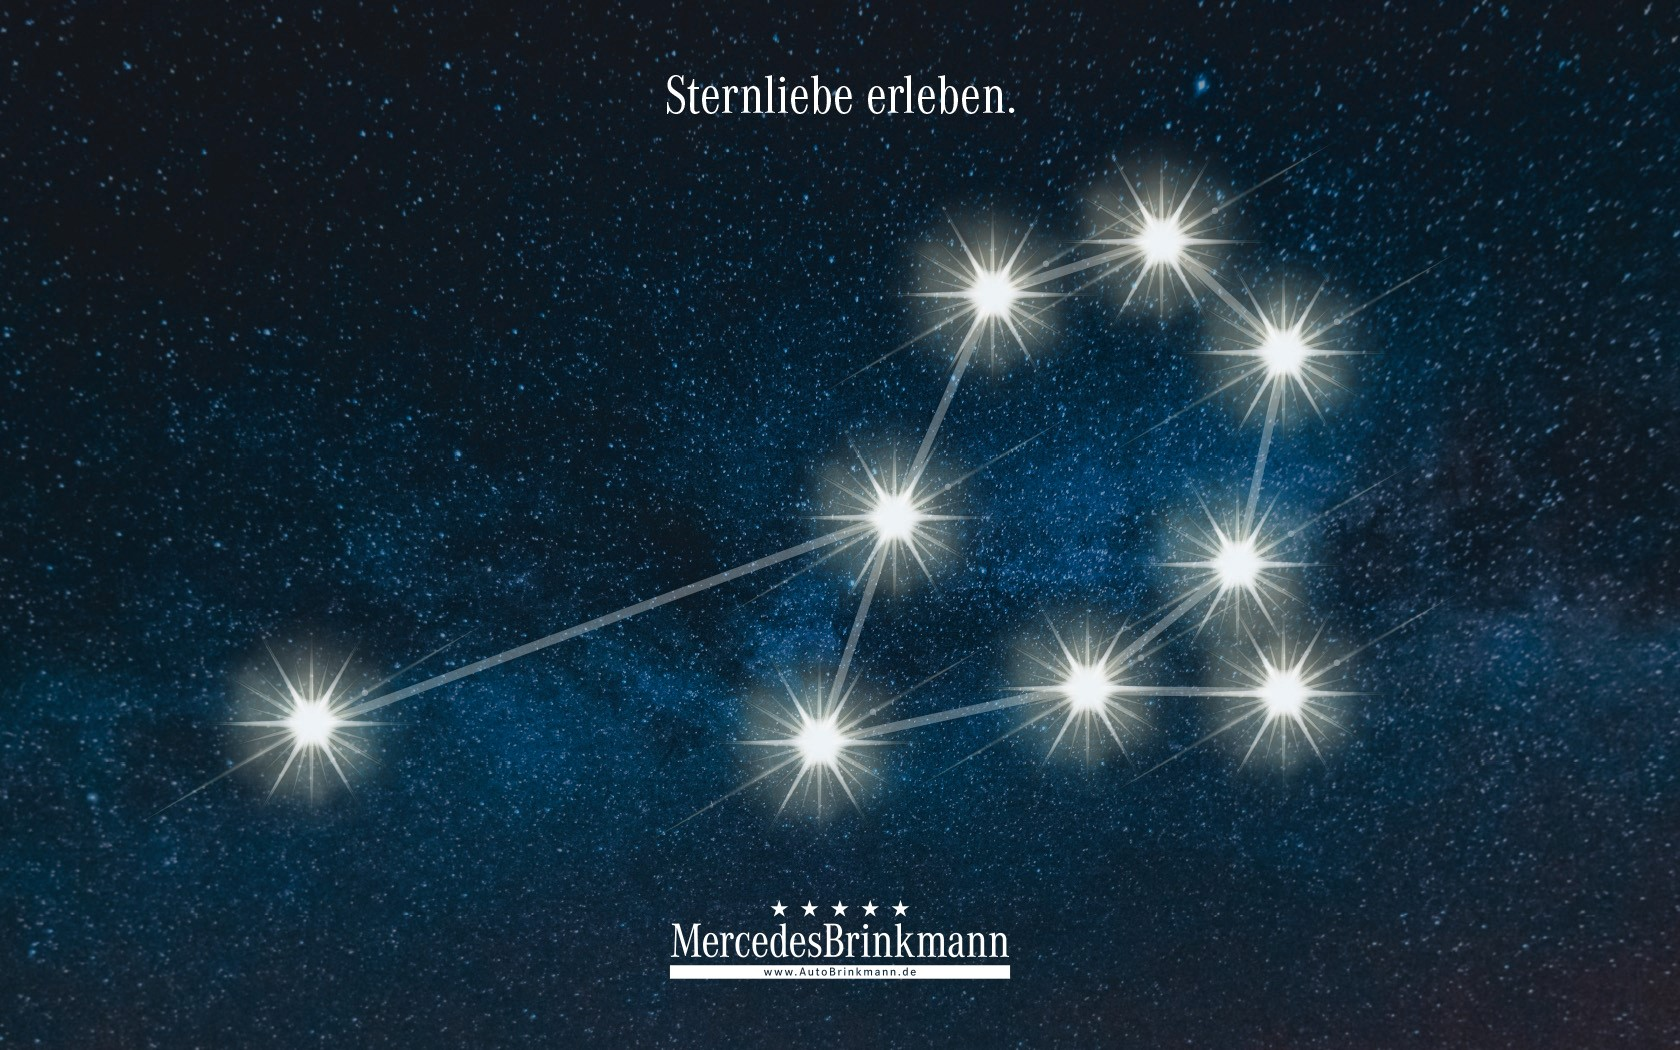 Mercedes Brinkmann Sternbild 0220